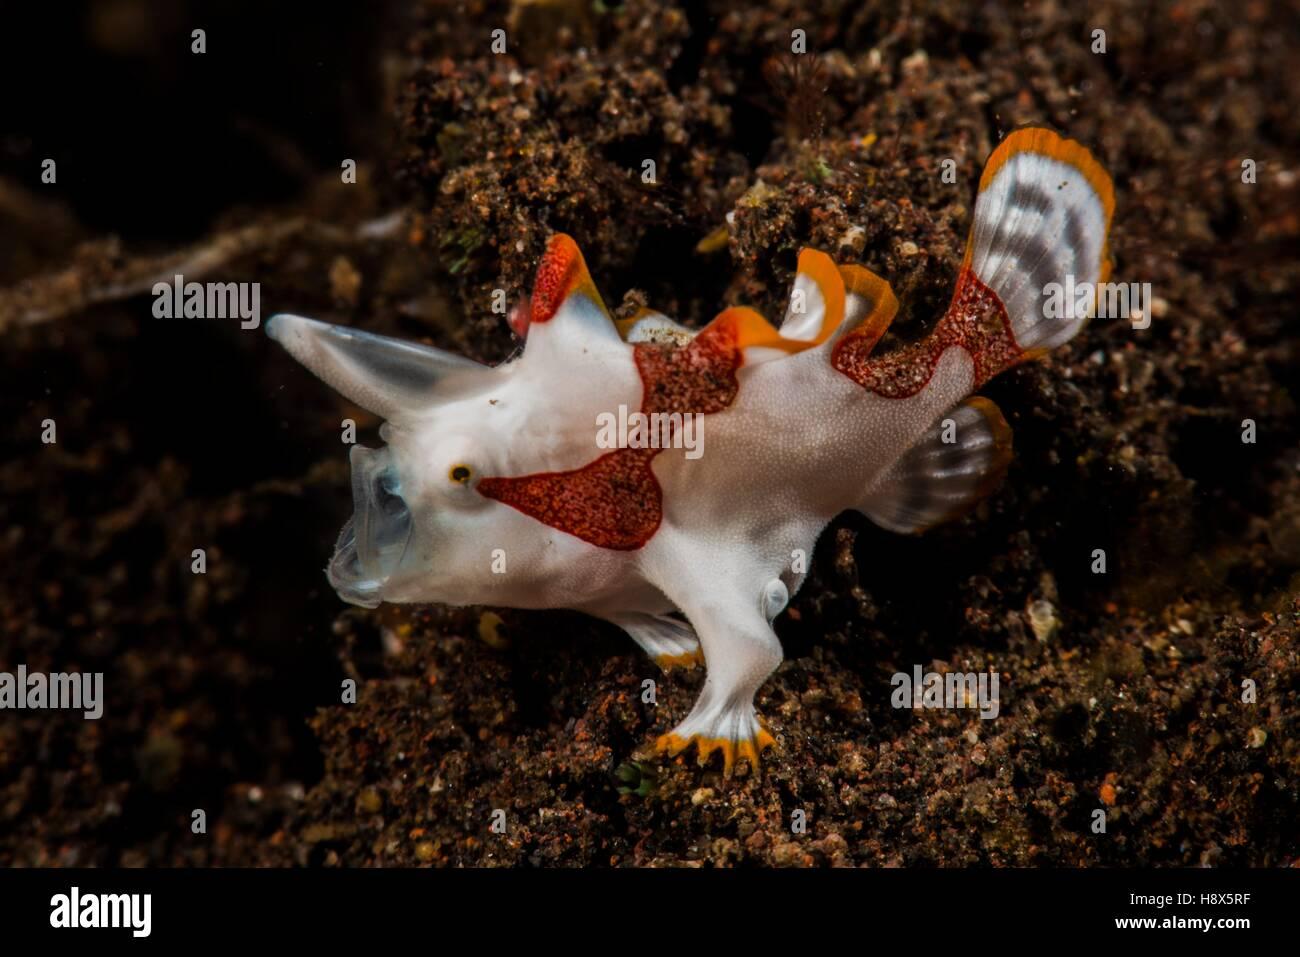 Warty frogfish (Antennarius maculatus), Bali, Indonesia - Stock Image